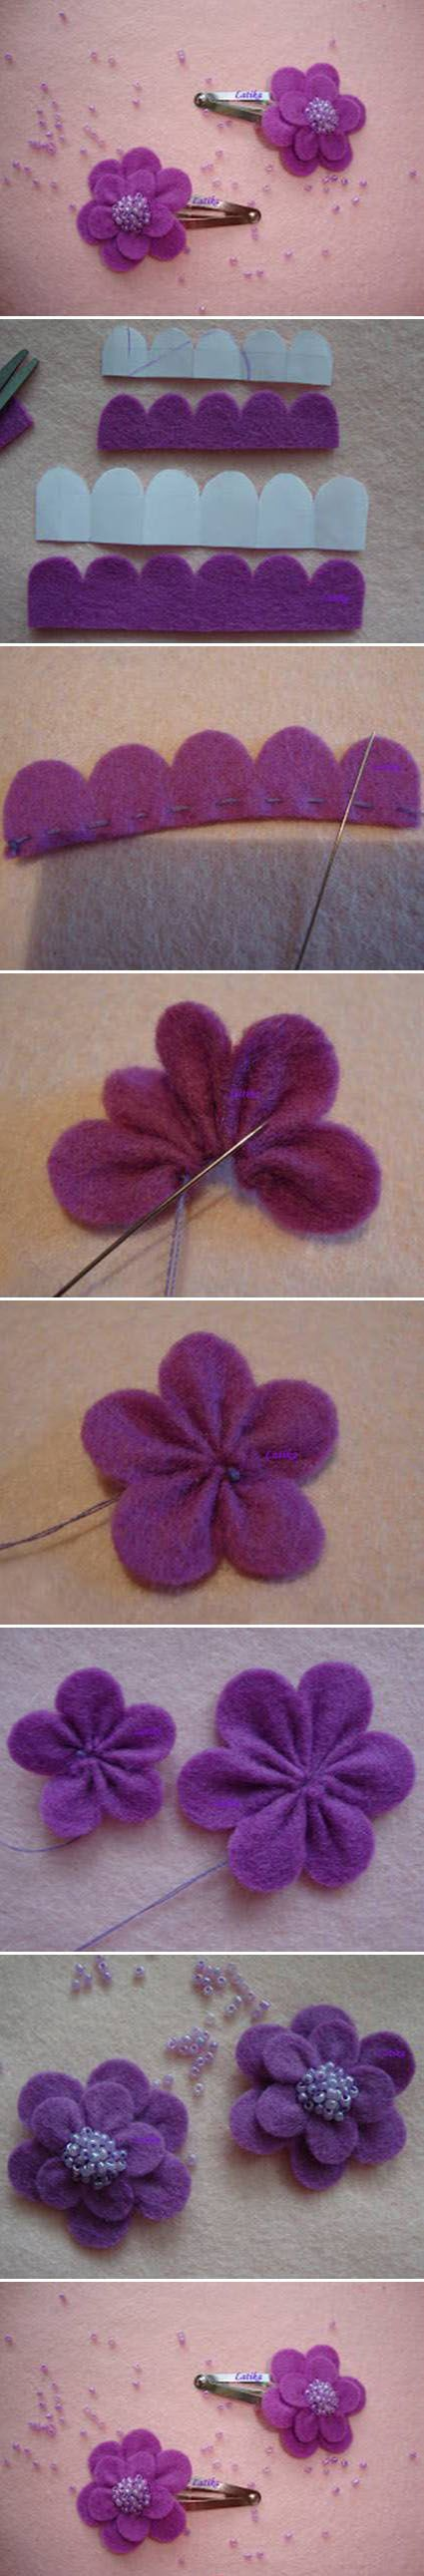 Purple Hair Clip   DIY Crafts Tutorials